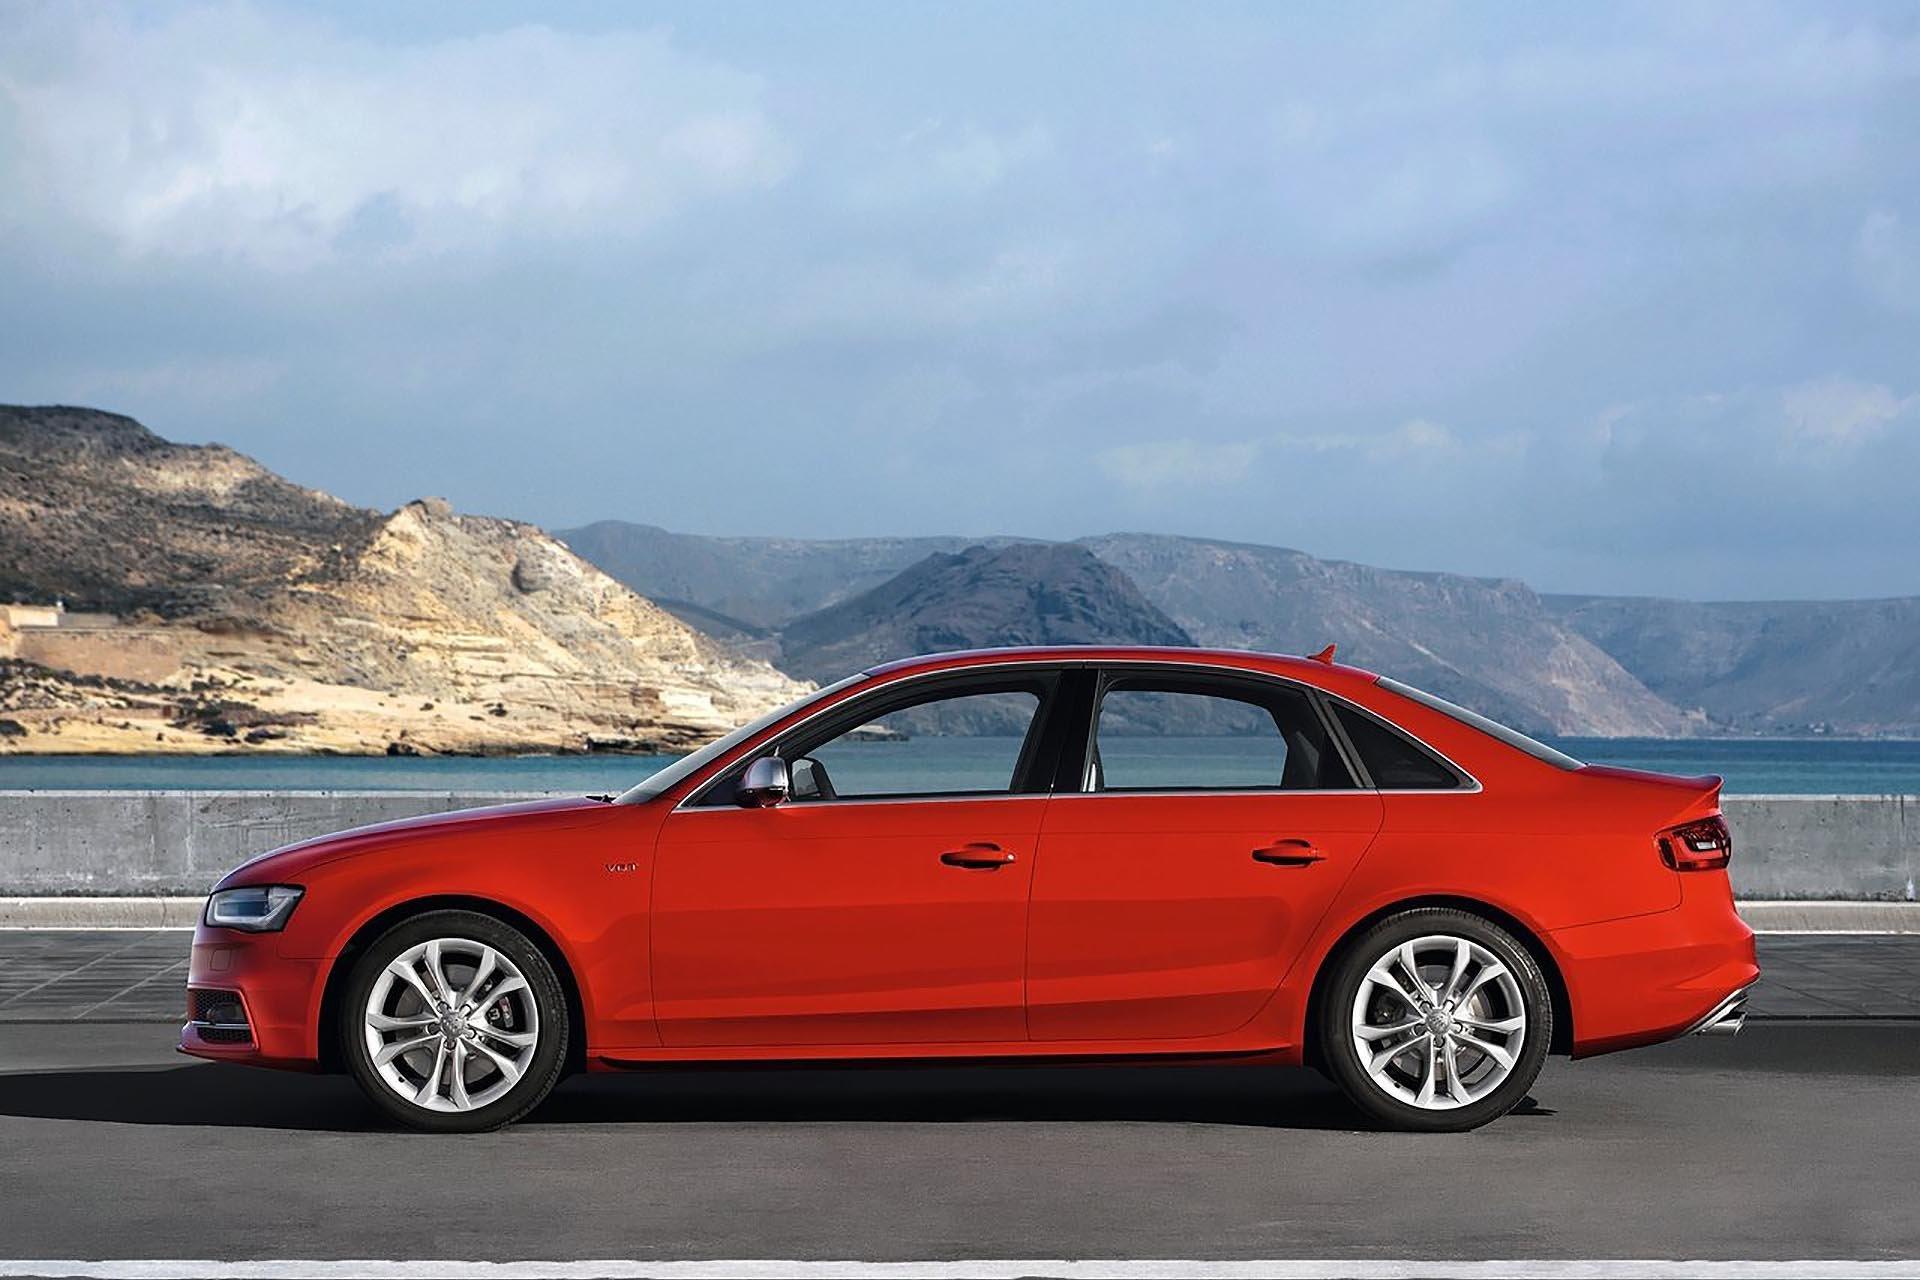 Audi B8 S4/S5 LOWERED FRONT THREE QUARTER